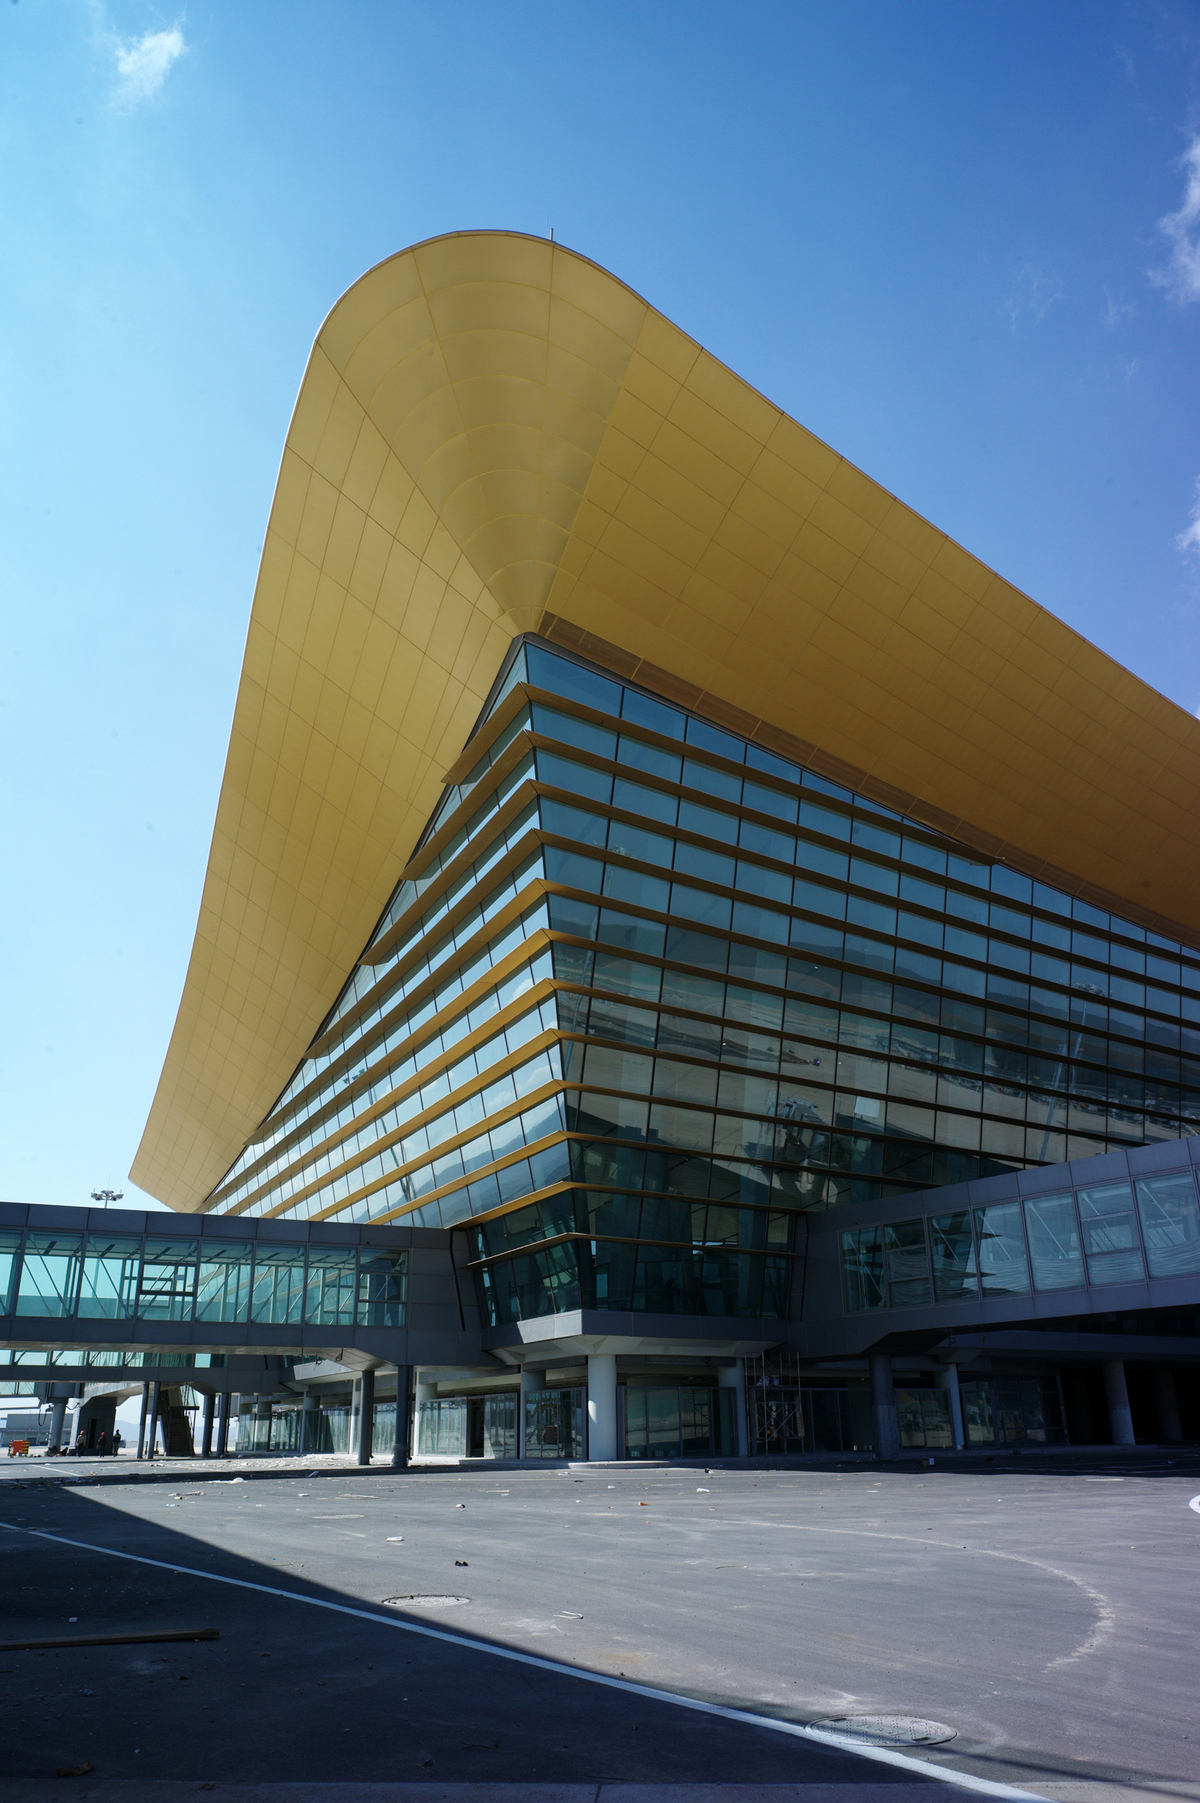 Kunming Changshui International Airport Hunter Douglas Architectural Archinect